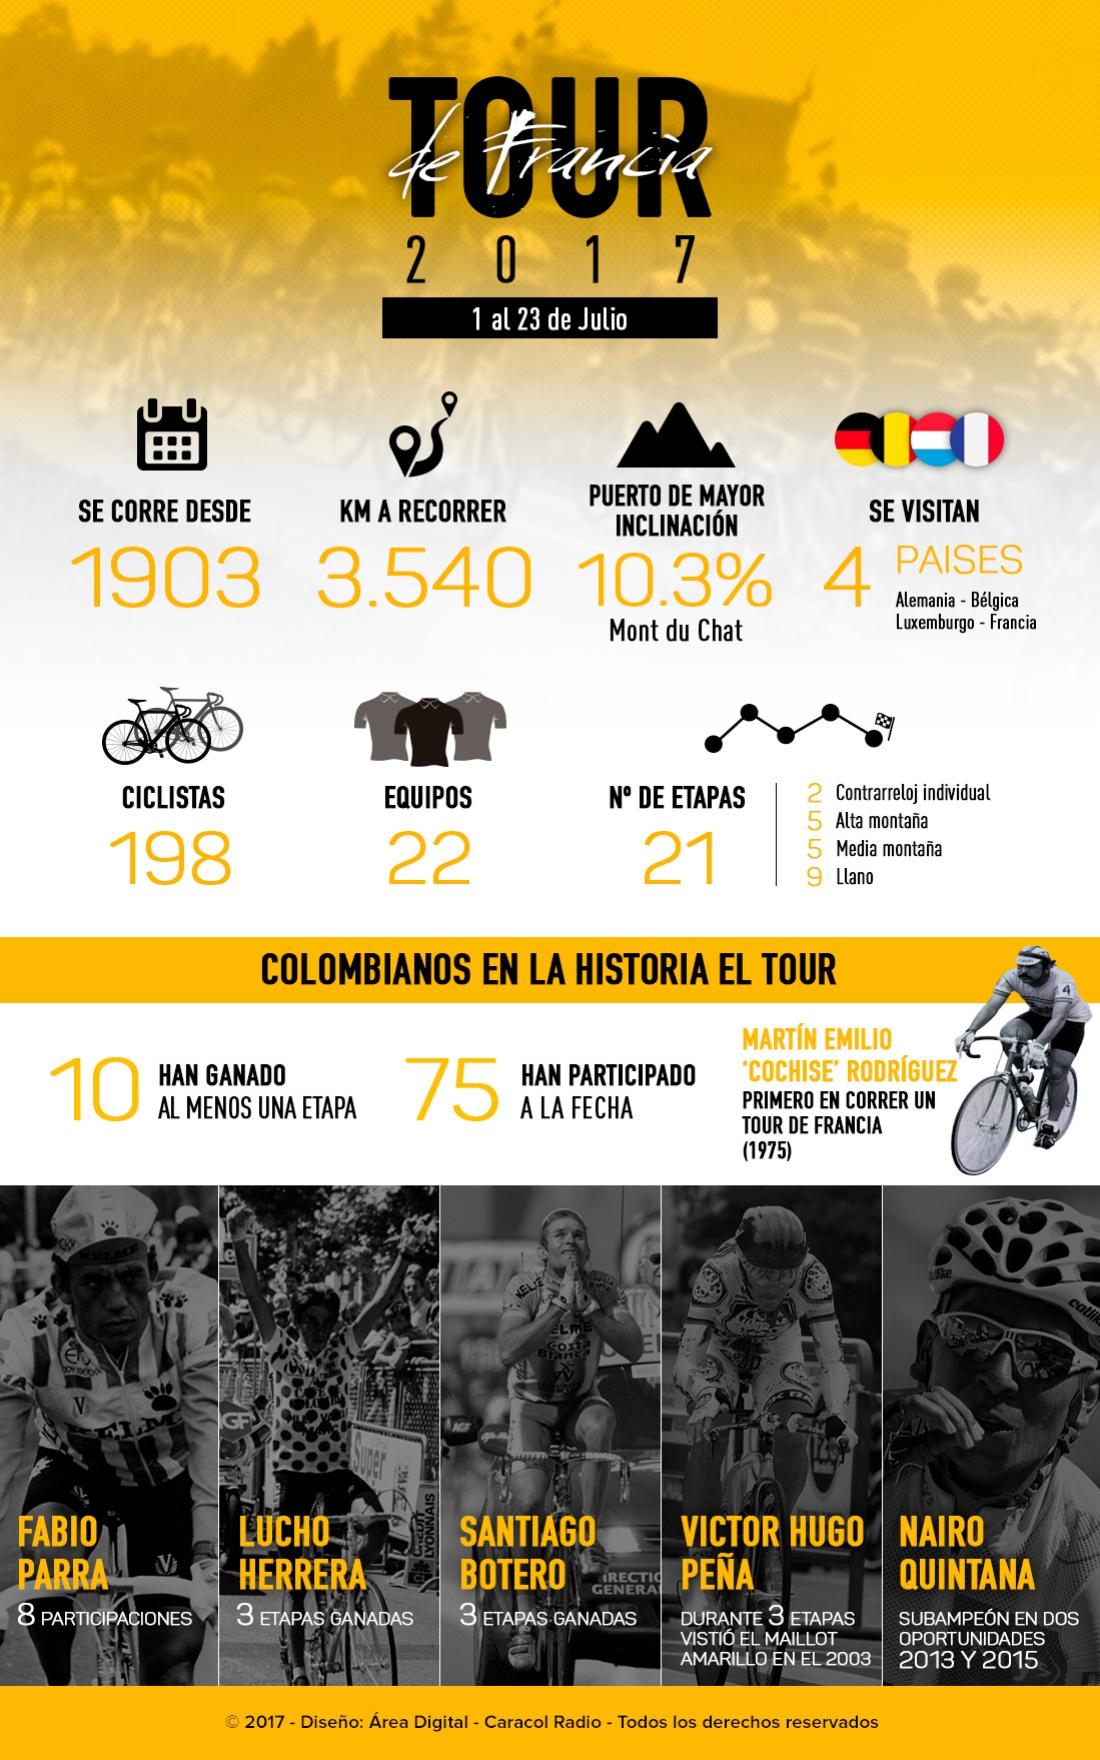 Colombianos historia Tour de Francia: Colombianos en la historia del Tour de Francia